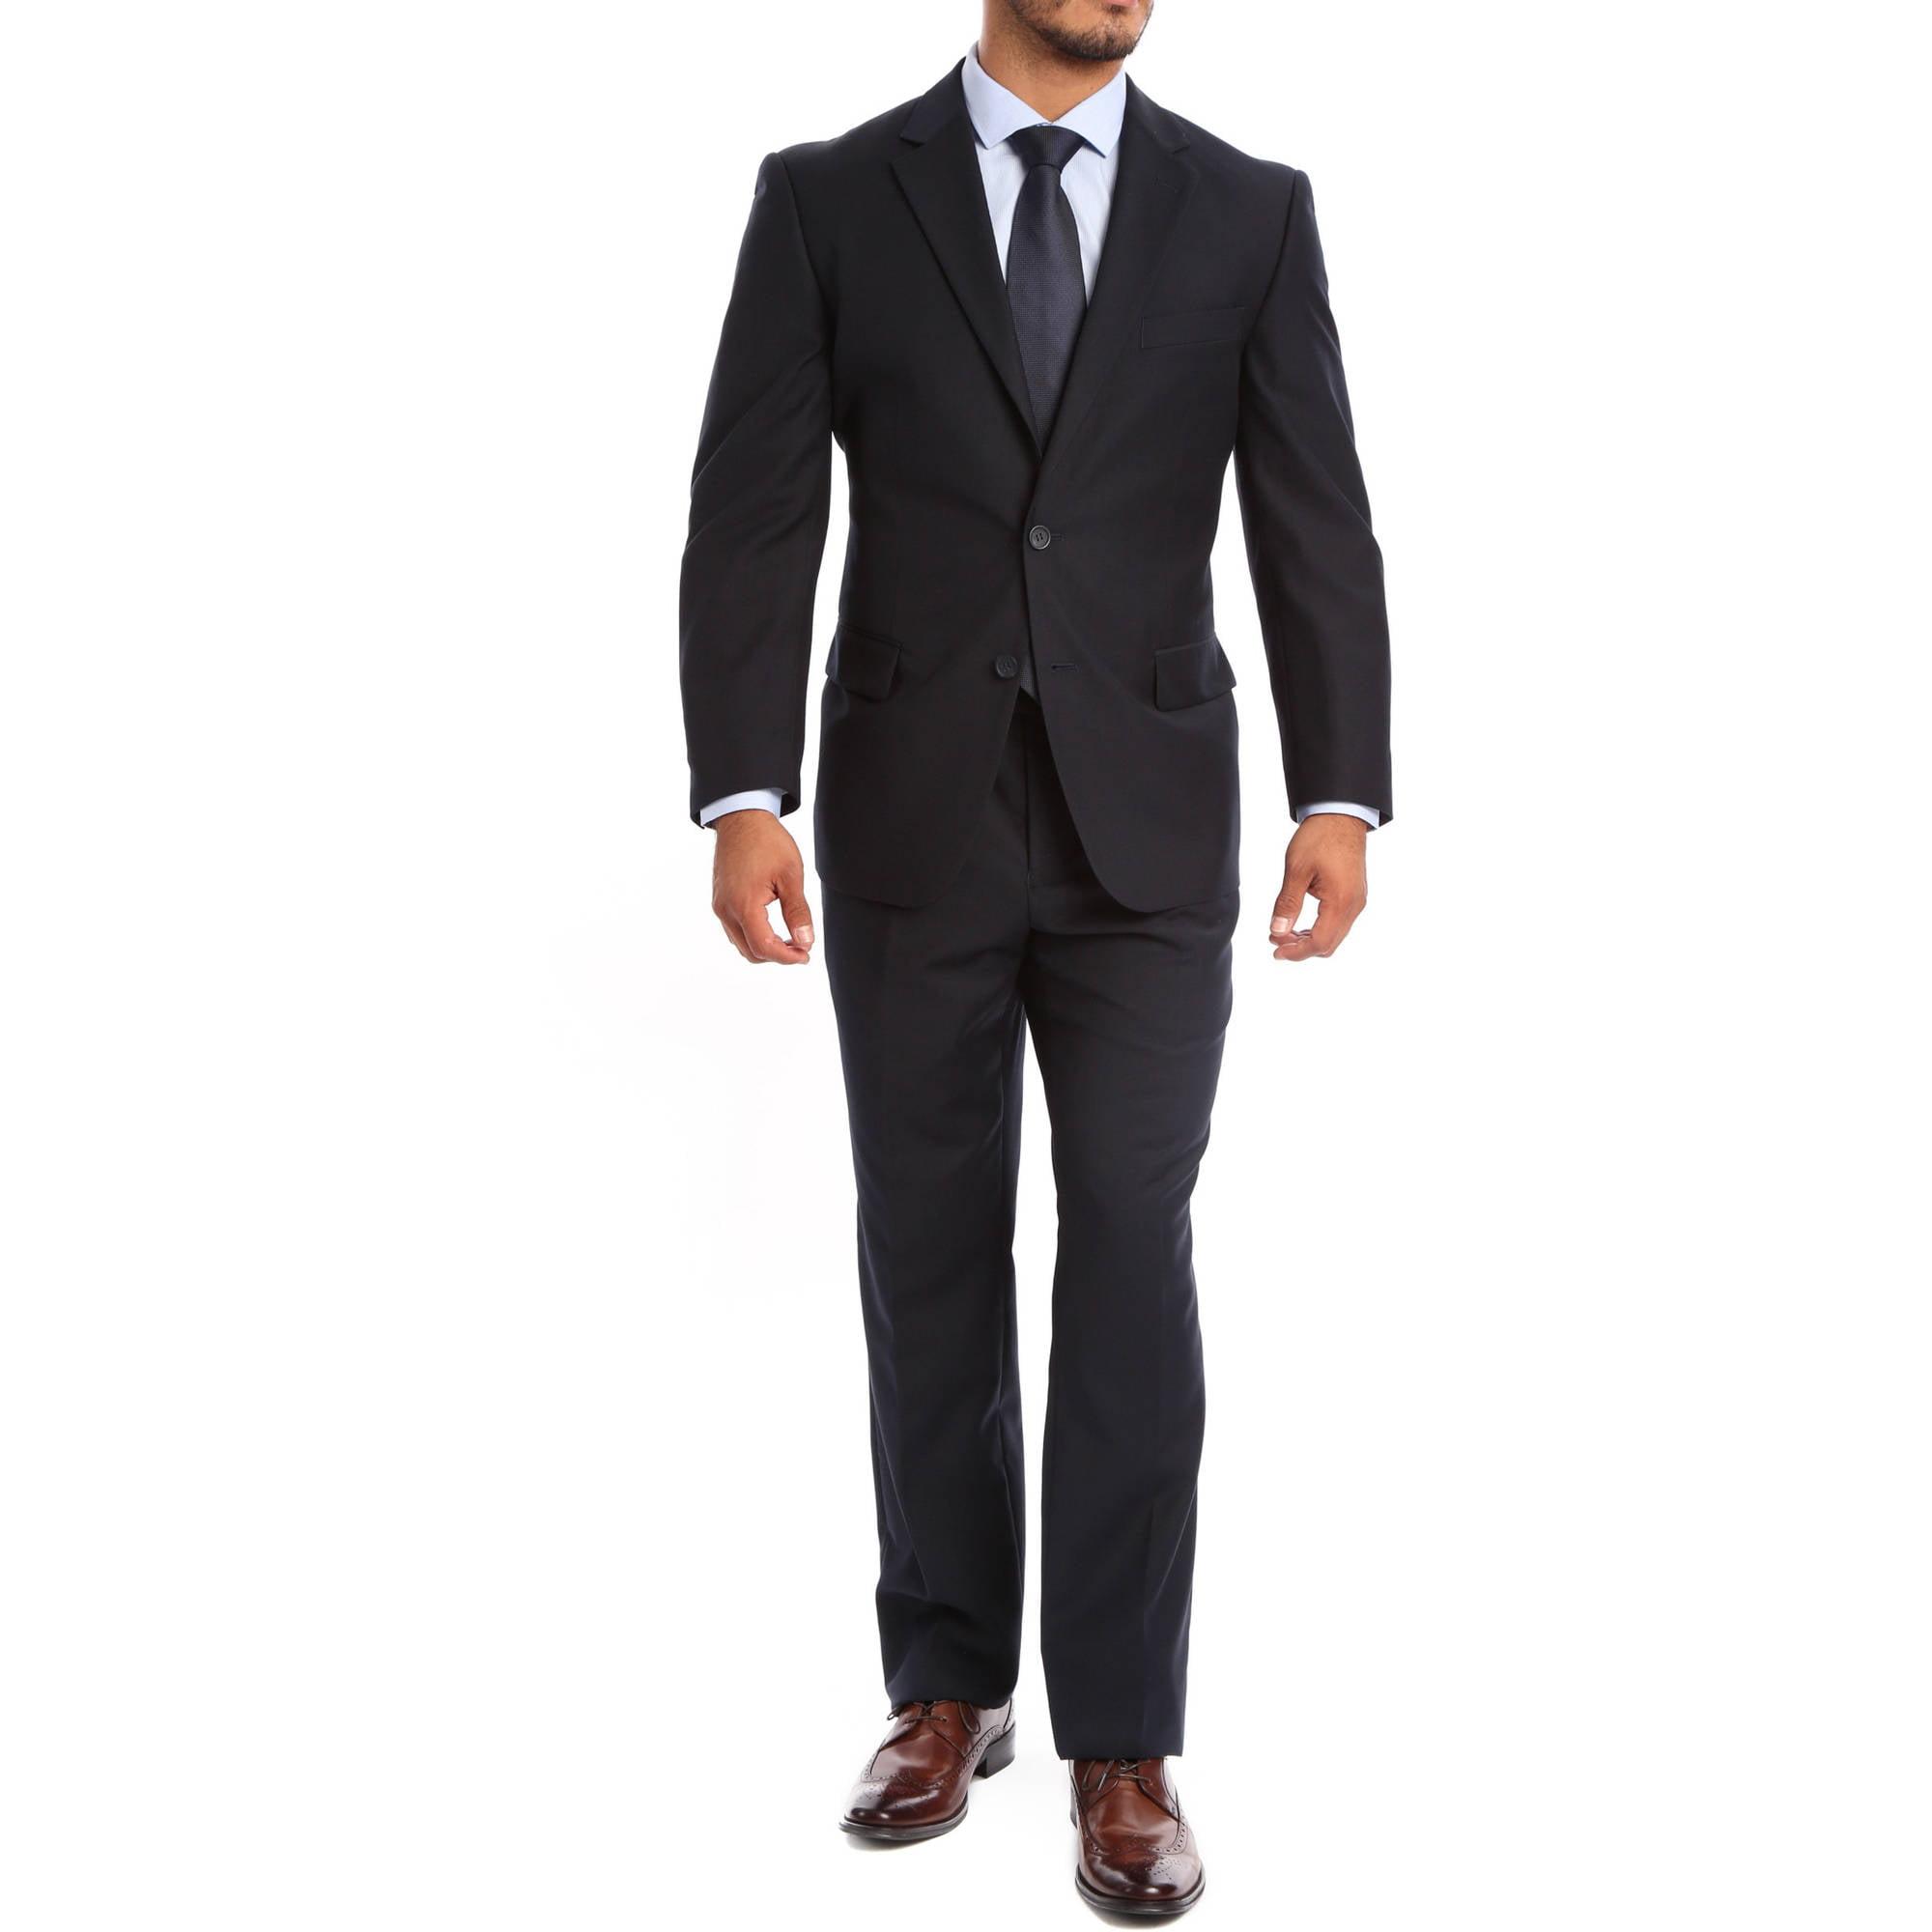 Verno Albani Big Men's Dark Navy Classic Fit Italian Styled Two Piece Suit